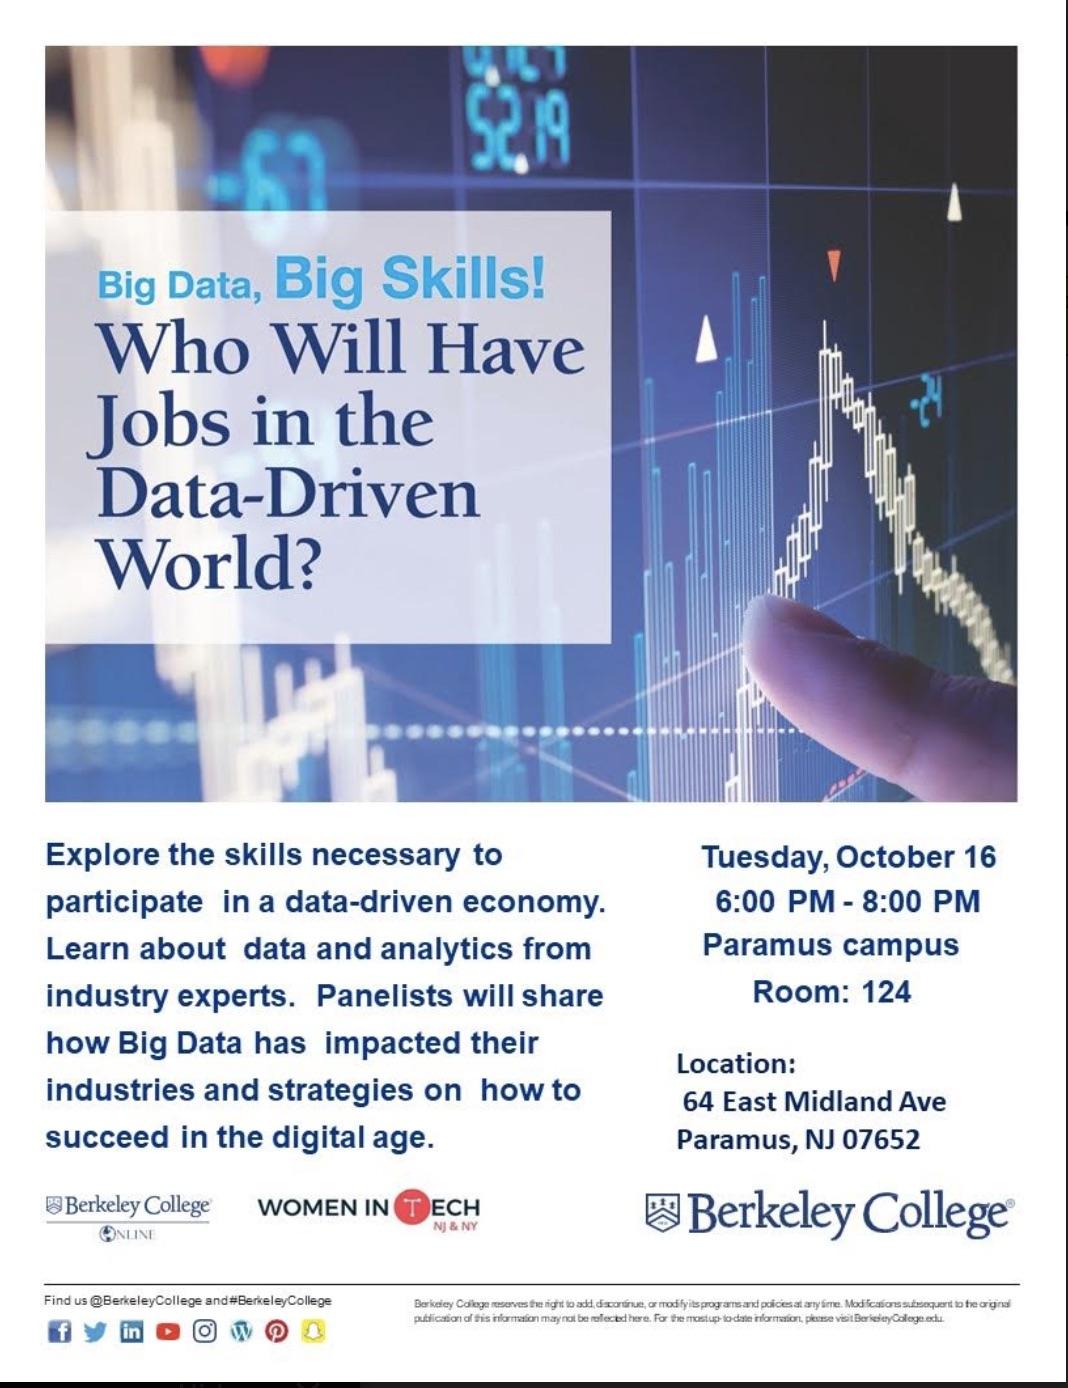 Big Data event flyer